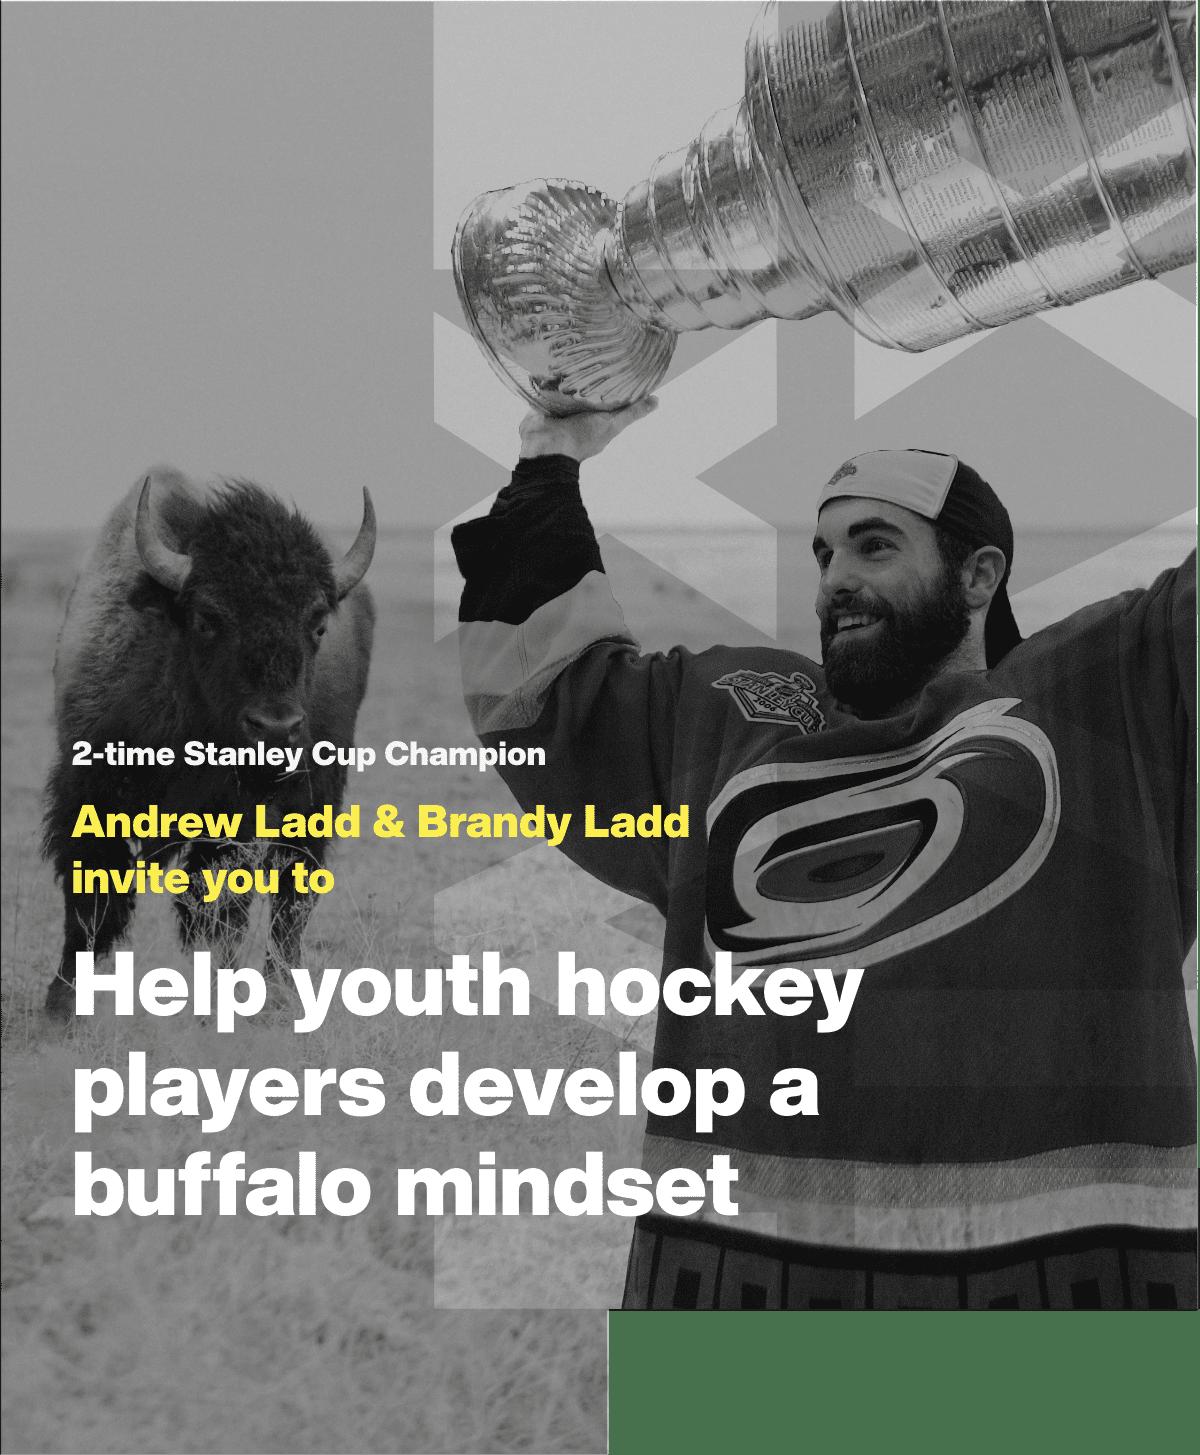 andrew-ladd-mental-performance-mental-health-hockey-sports-psychology-buffalo-mindset-barb-egan